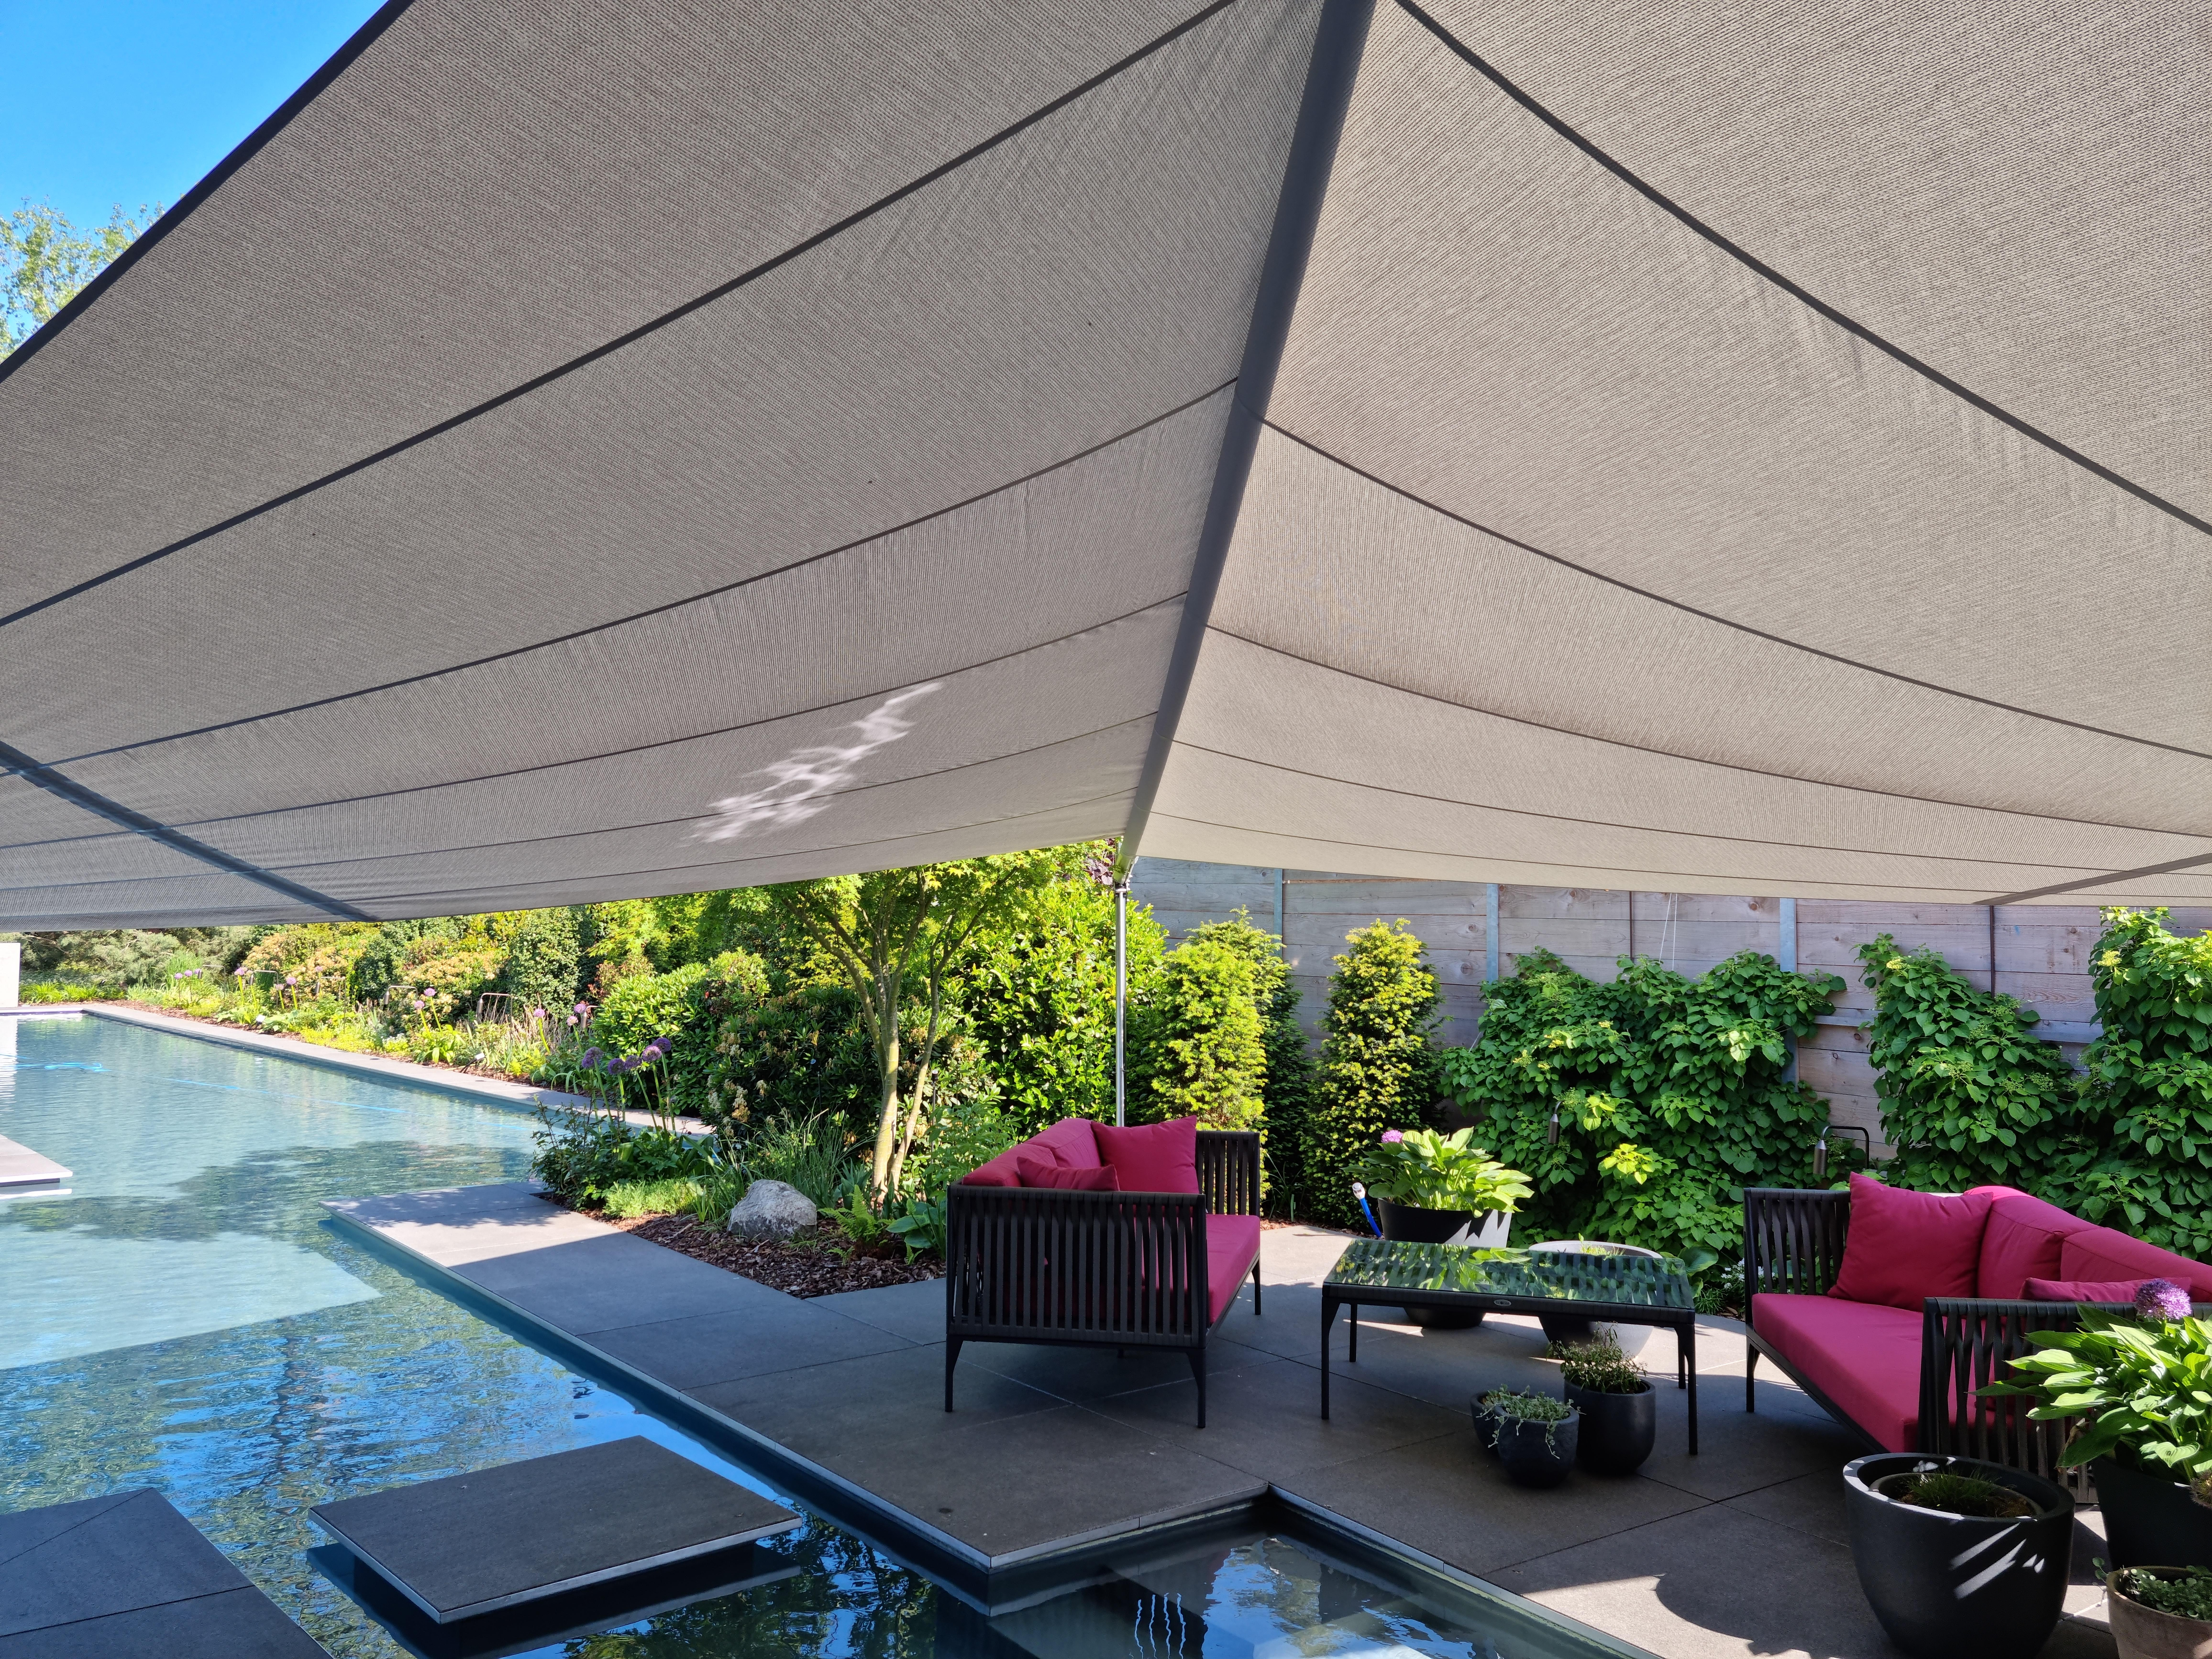 SunSquare - Zimmermann Sonnenschutzsysteme